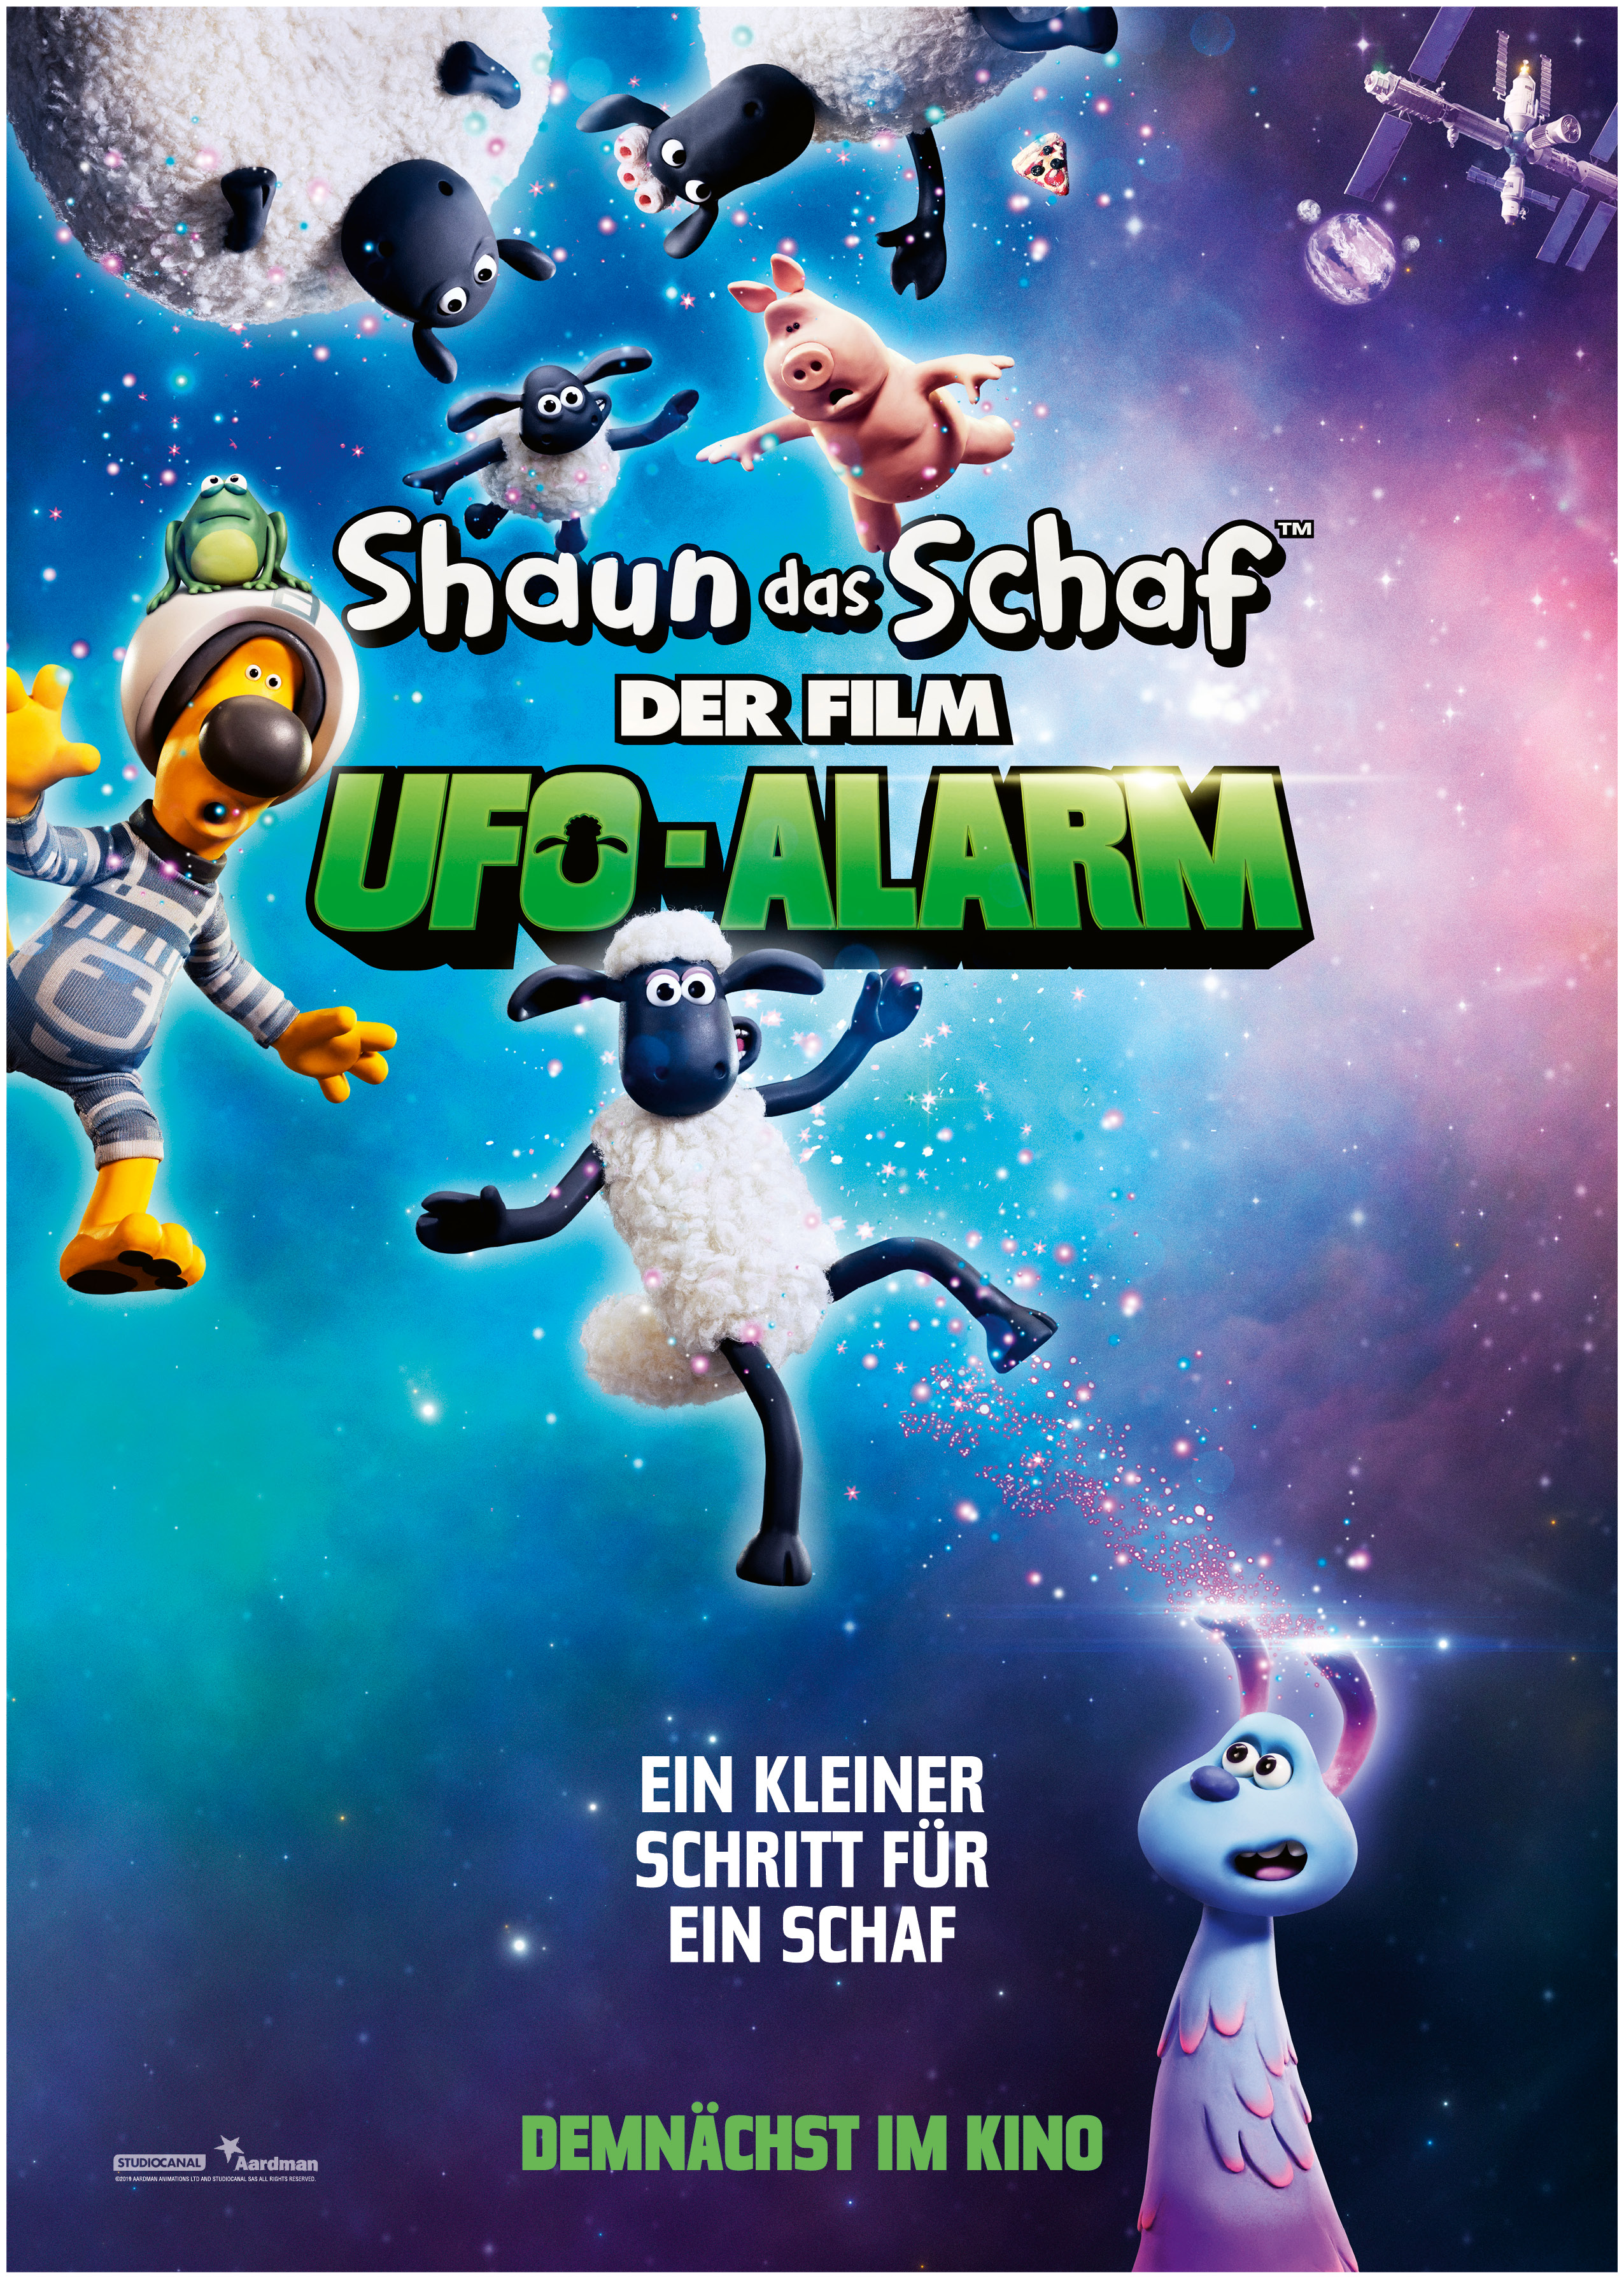 Shaun Das Schaf Ufo Alarm Plakat2 Digitaleleinwand